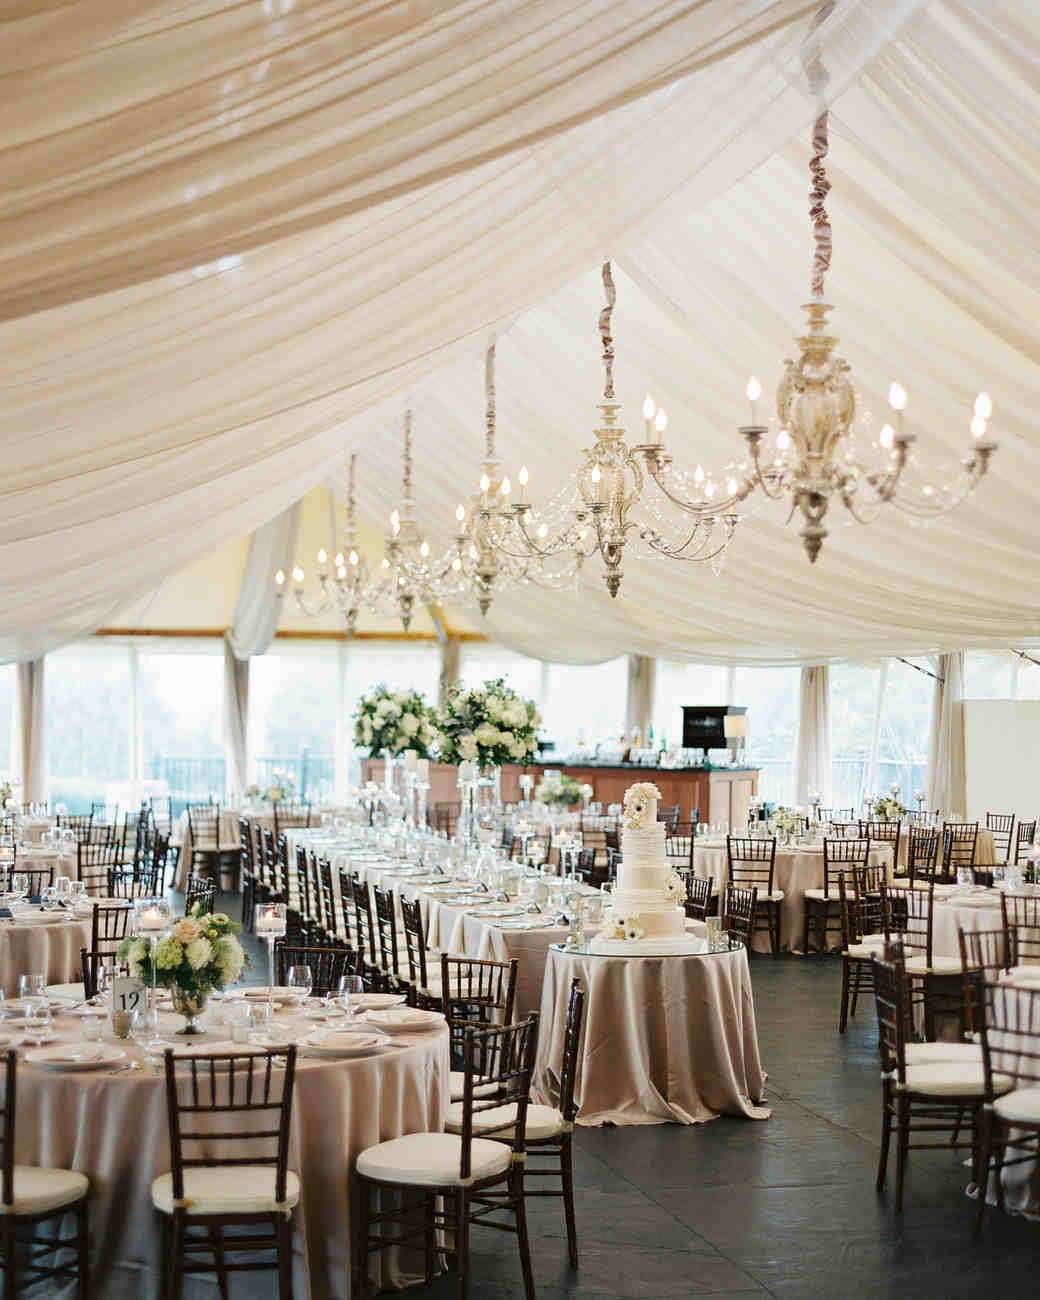 33 Tent Decorating Ideas to Upgrade Your Wedding Reception  Martha Stewart Weddings